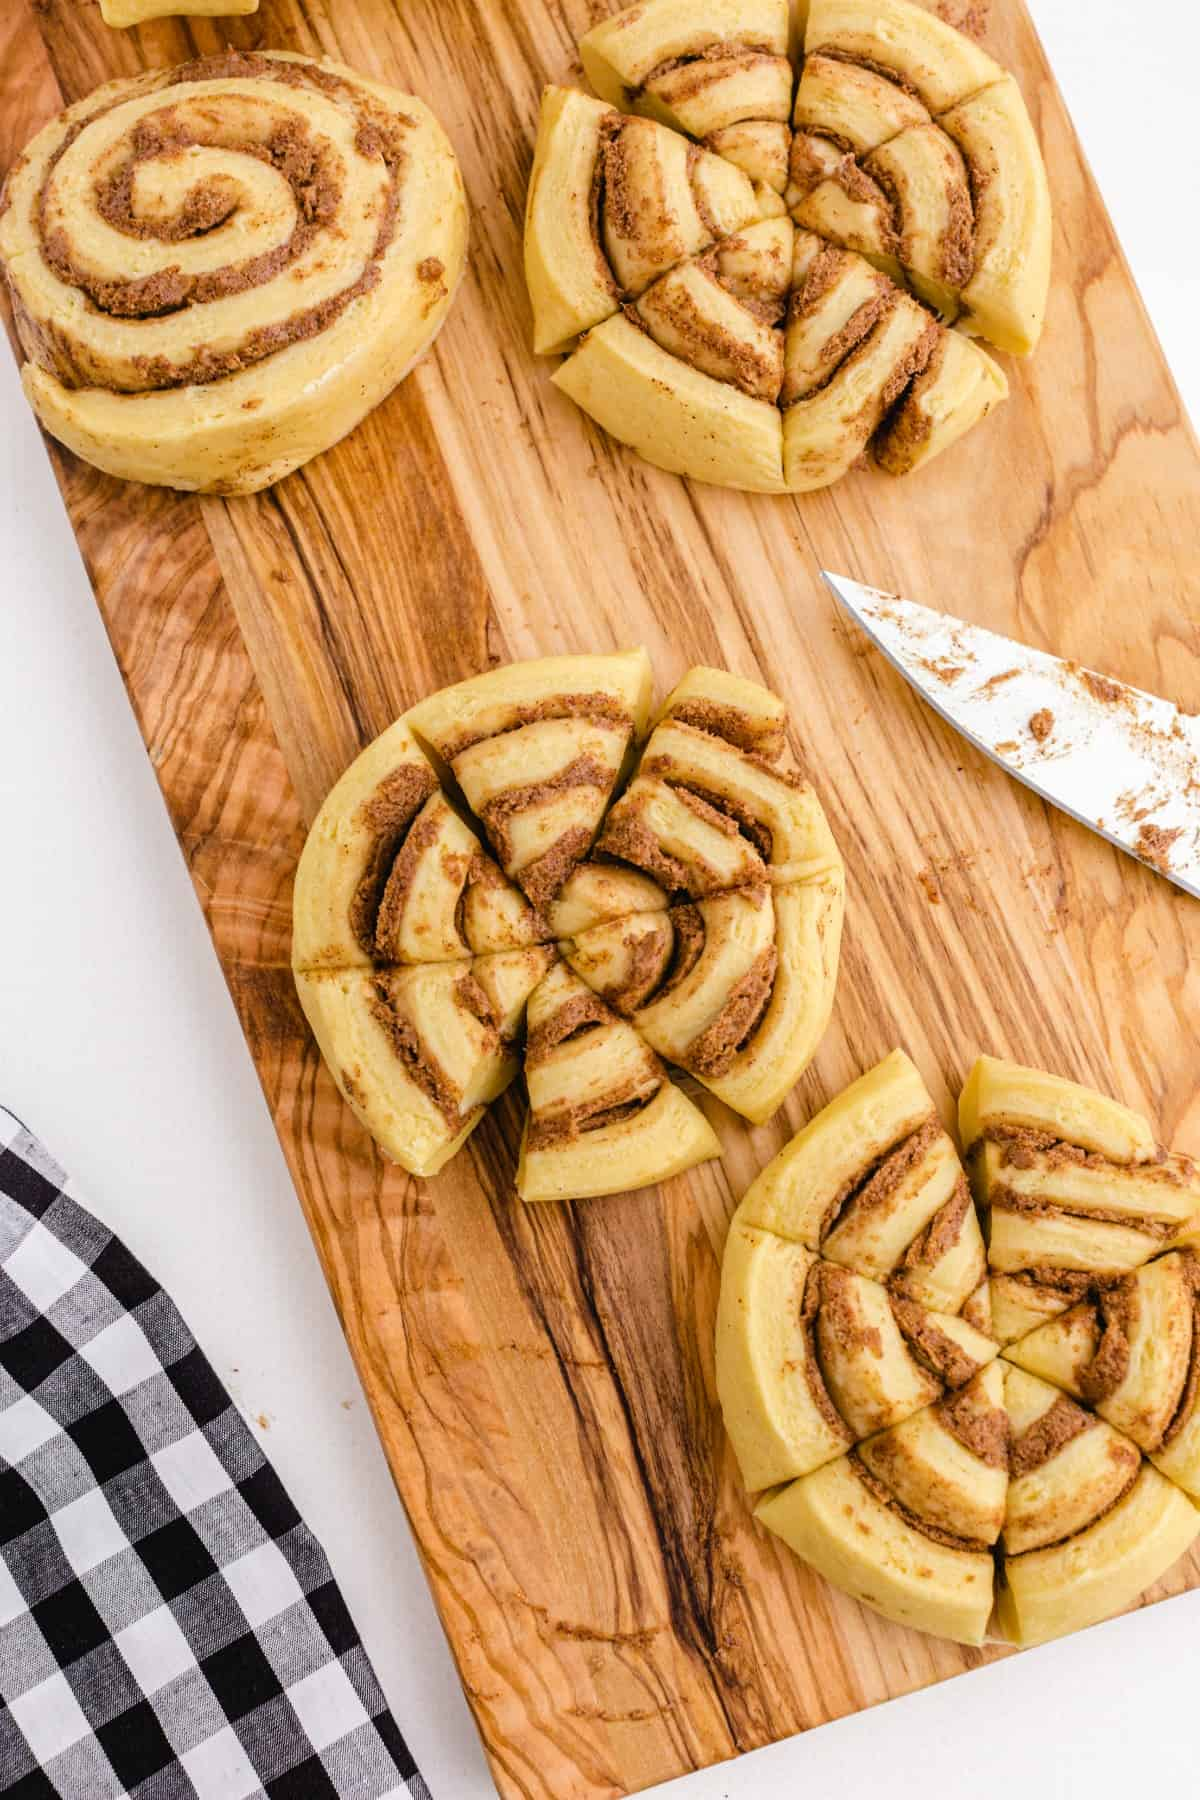 Cinnamon buns cut into quarters